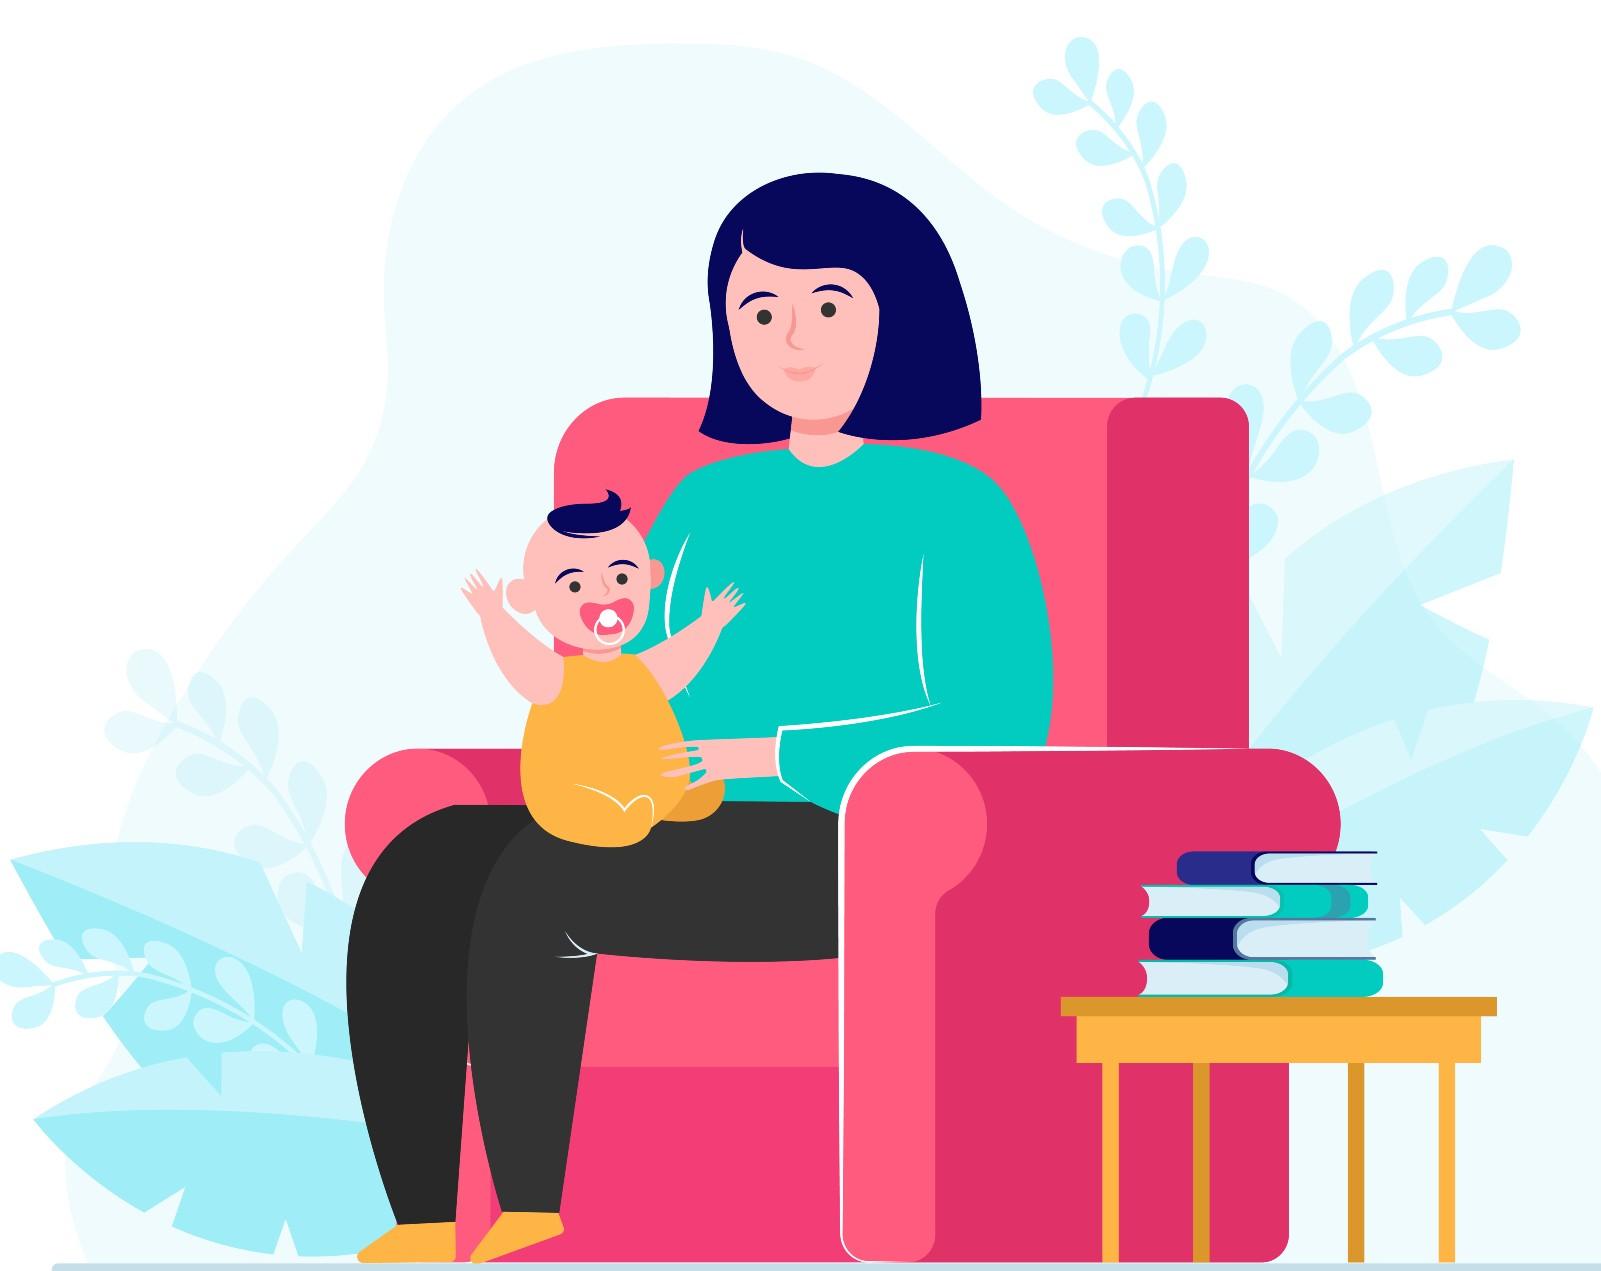 genetic testing for babies